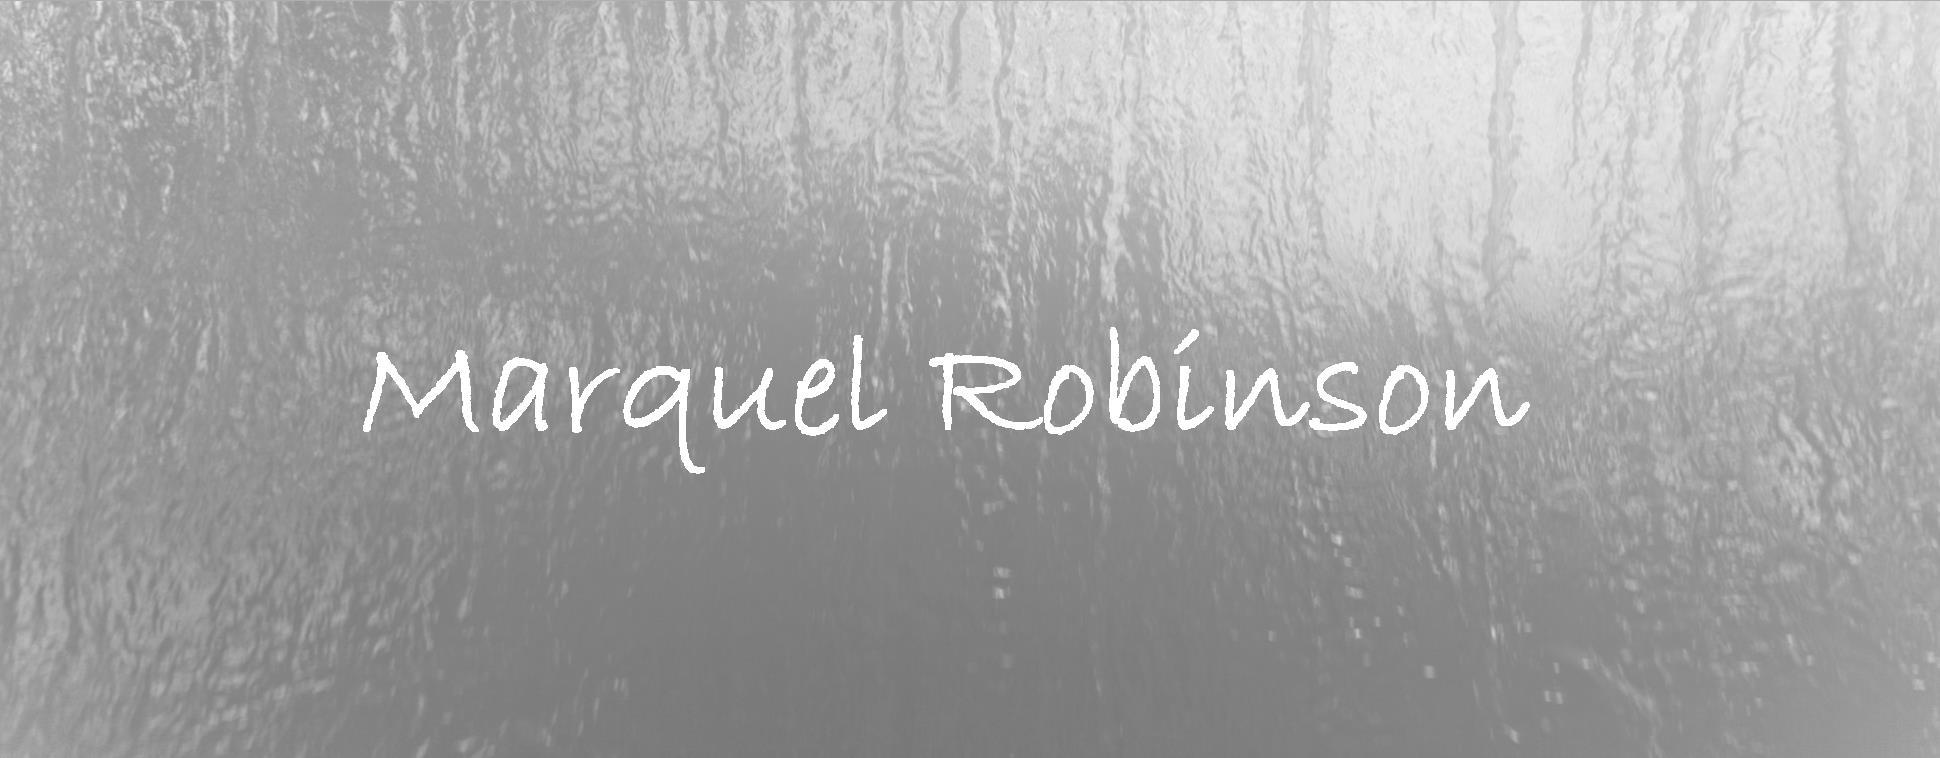 Marquel Robinson.jpg